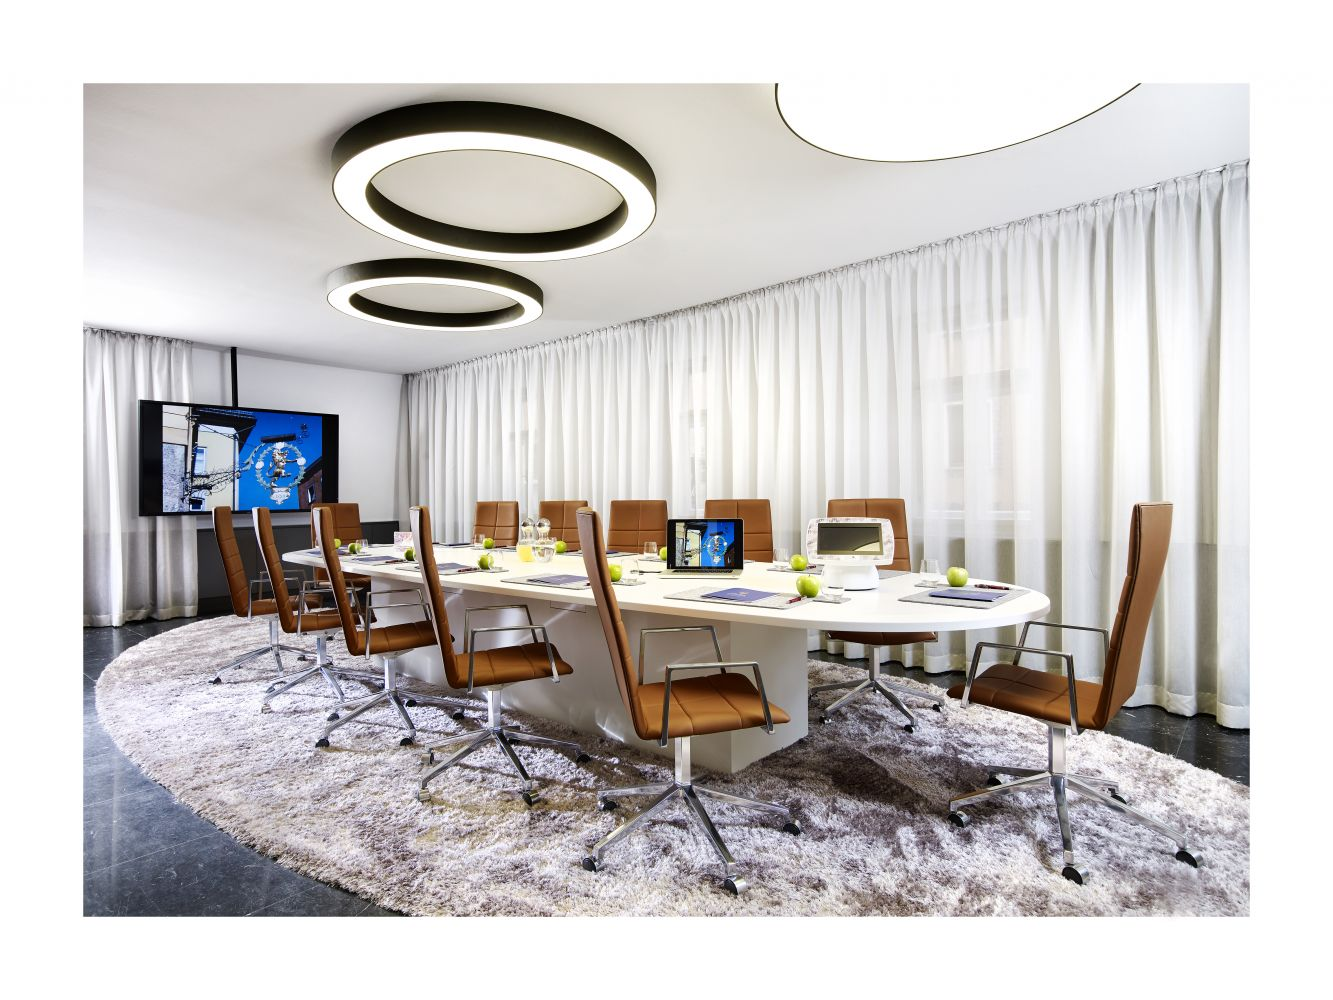 Hotel innsbruck lammhults for Innsbruck design hotel